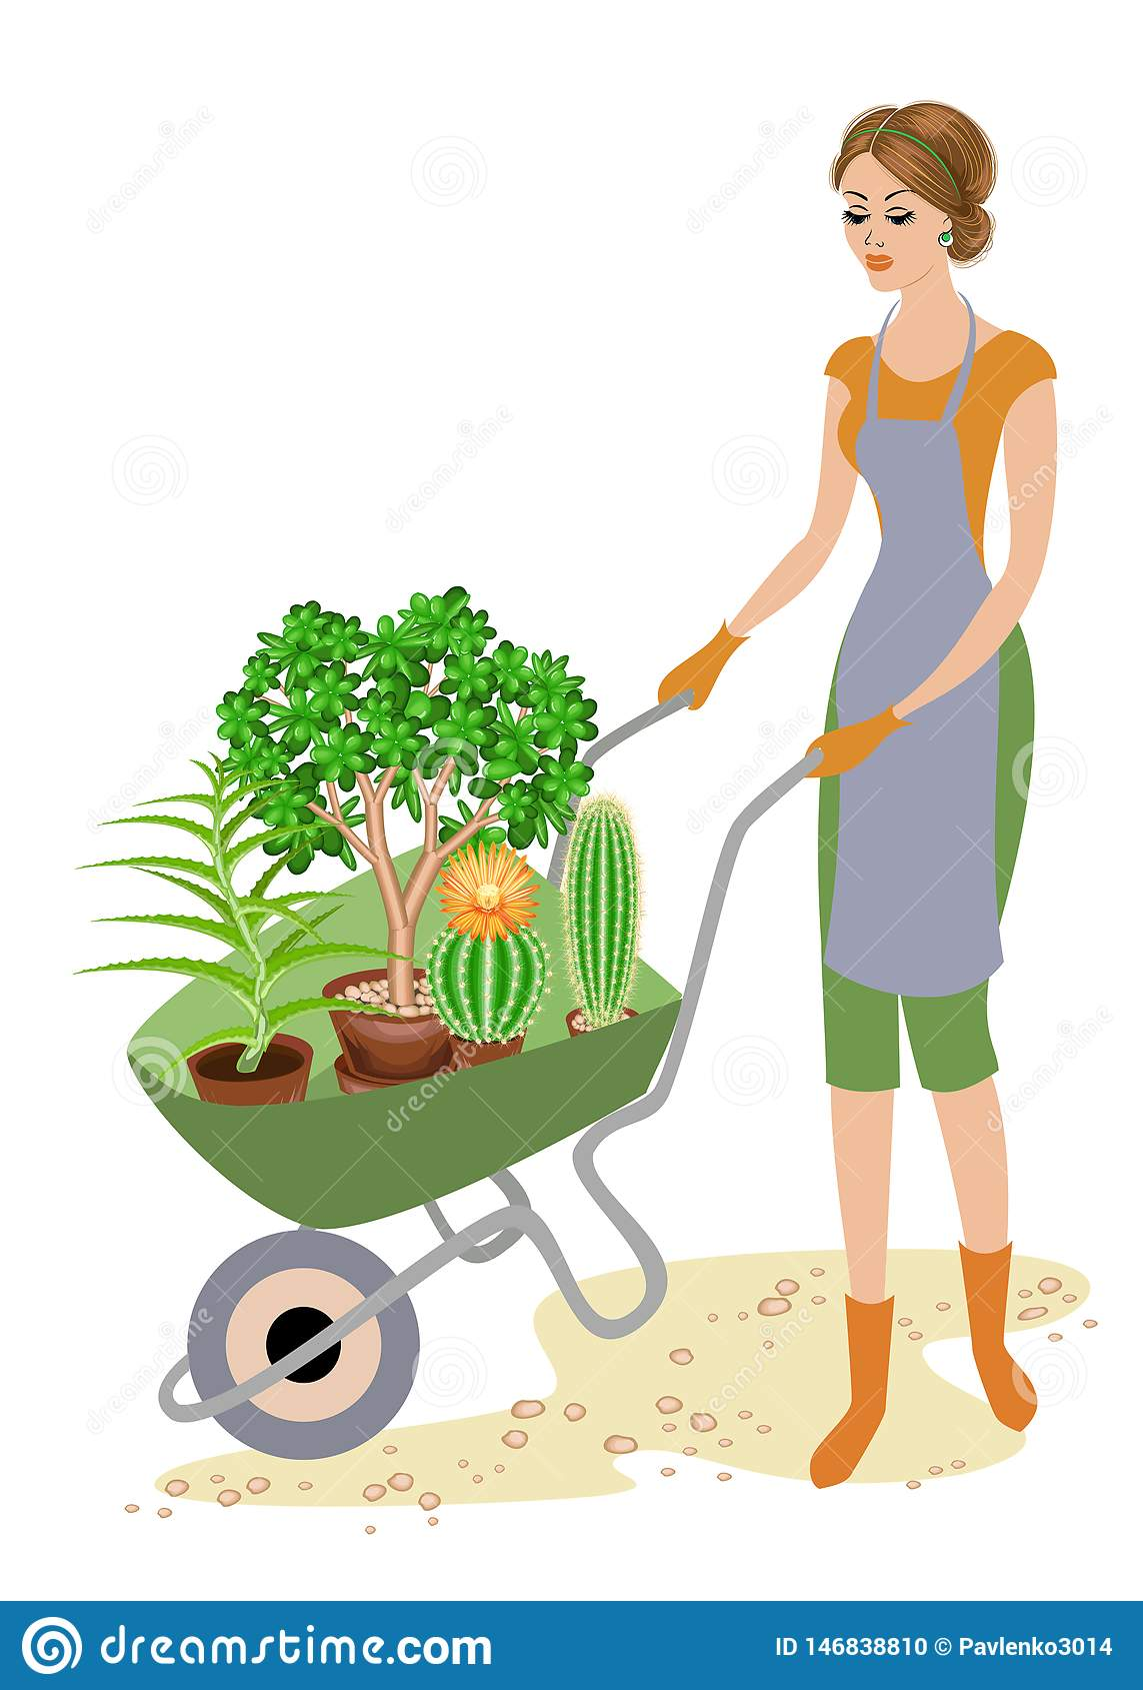 A good lady in work clothes. The girl wears a garden wheelbarrow with pots, cactuses, aloe, crassula. A woman works as a gardener